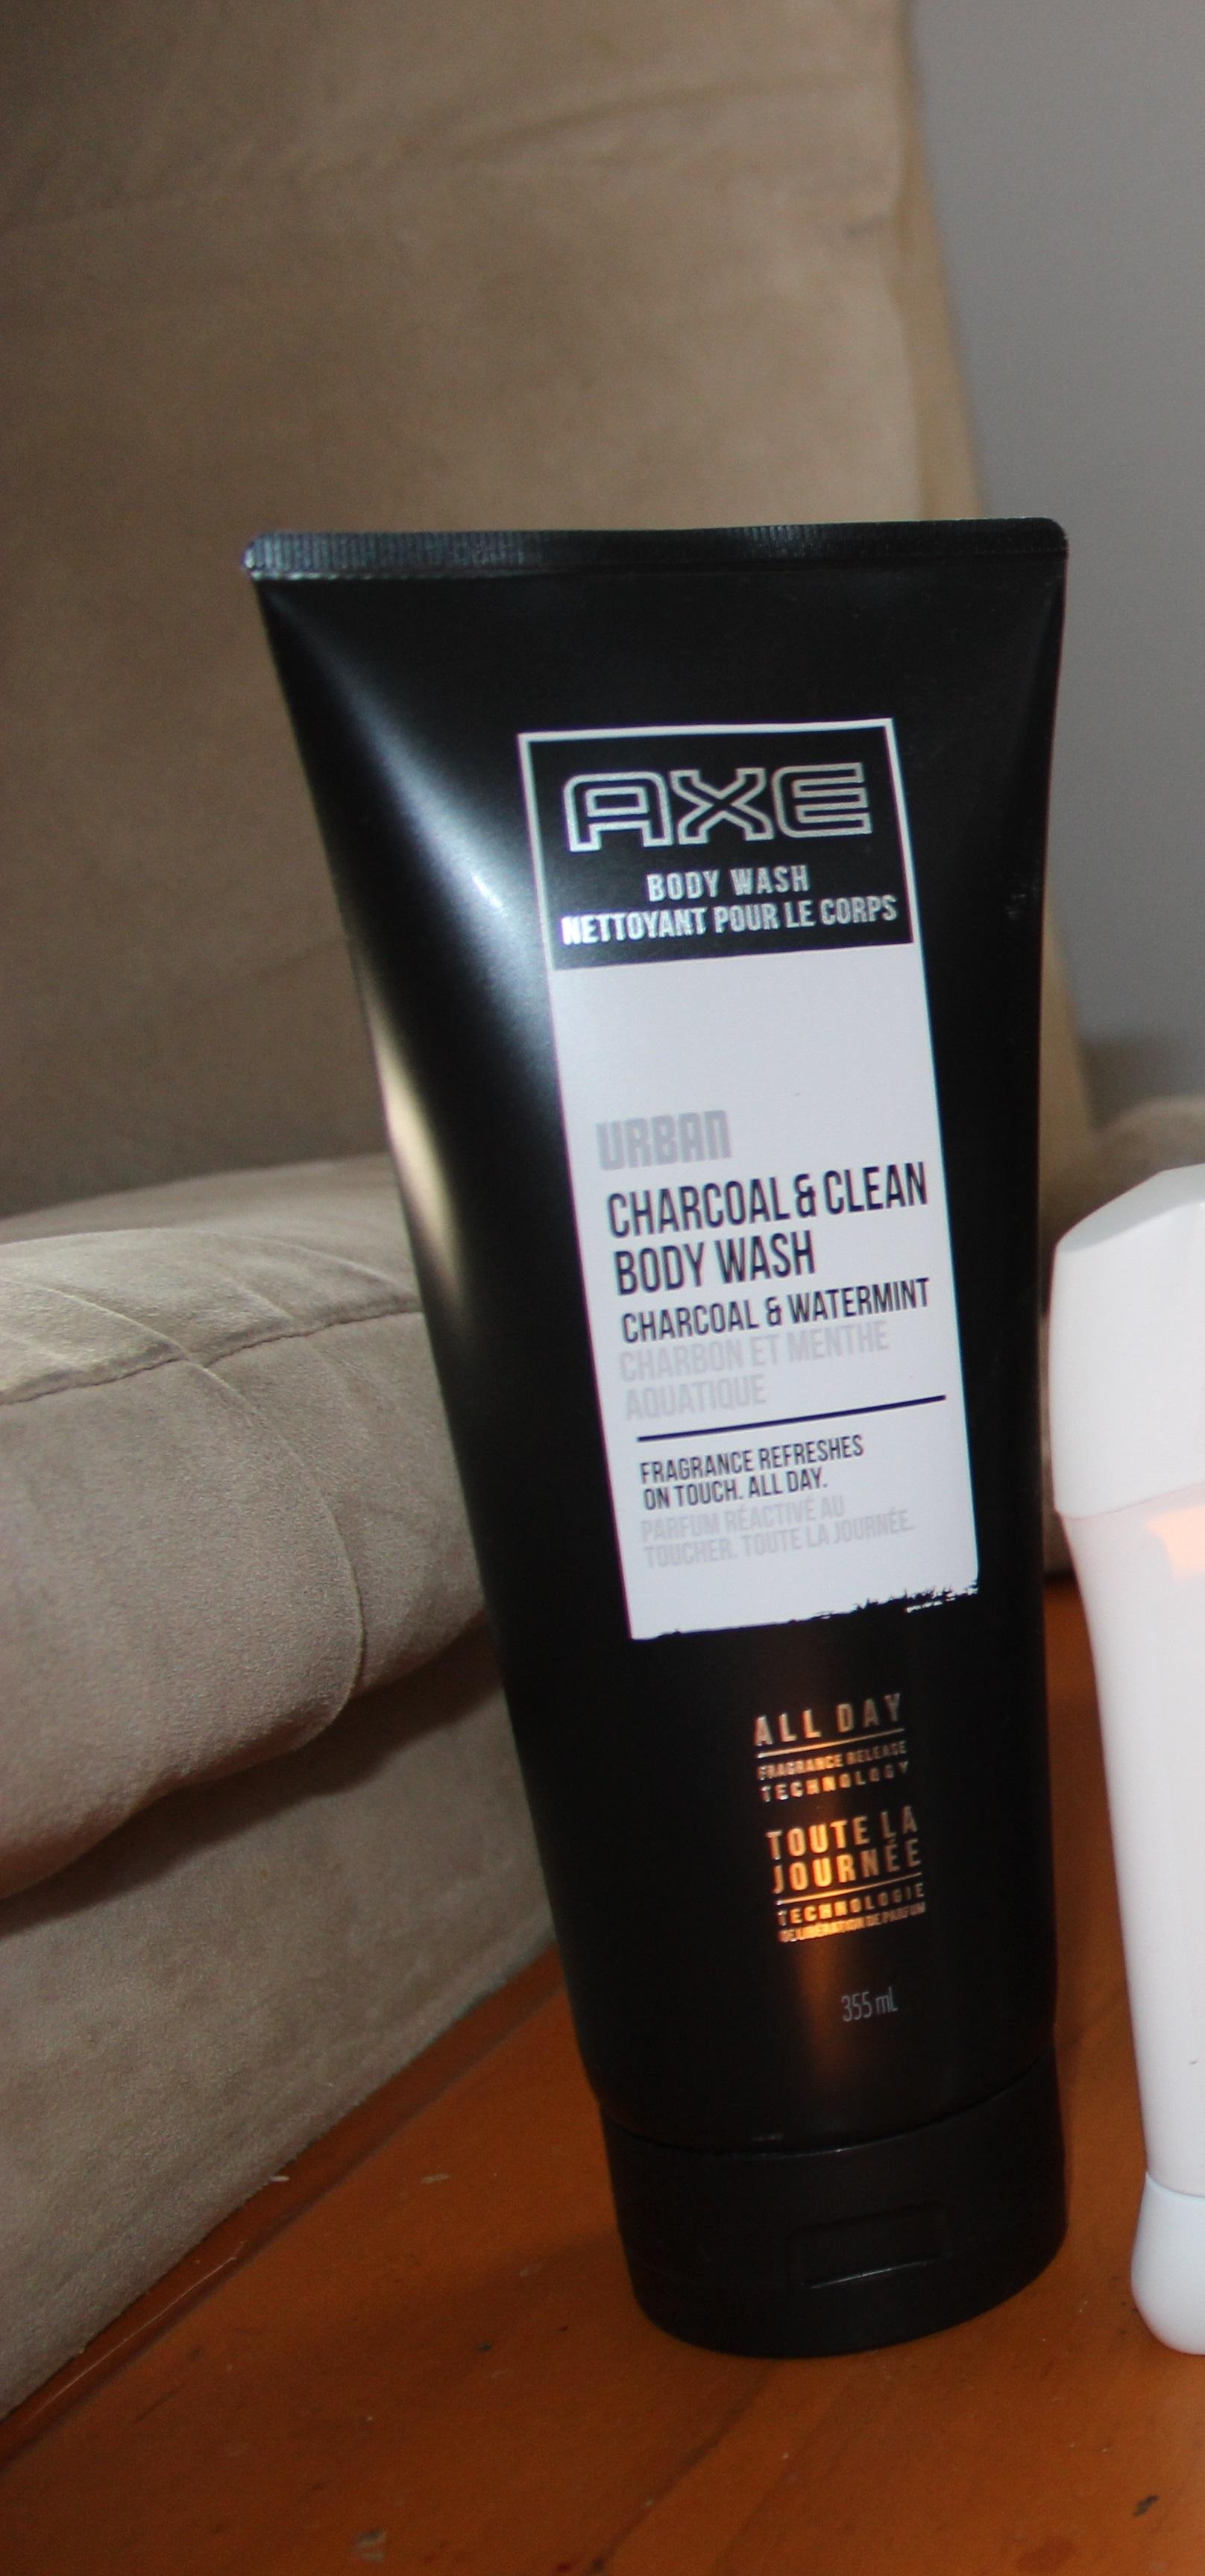 Cln body wash reviews